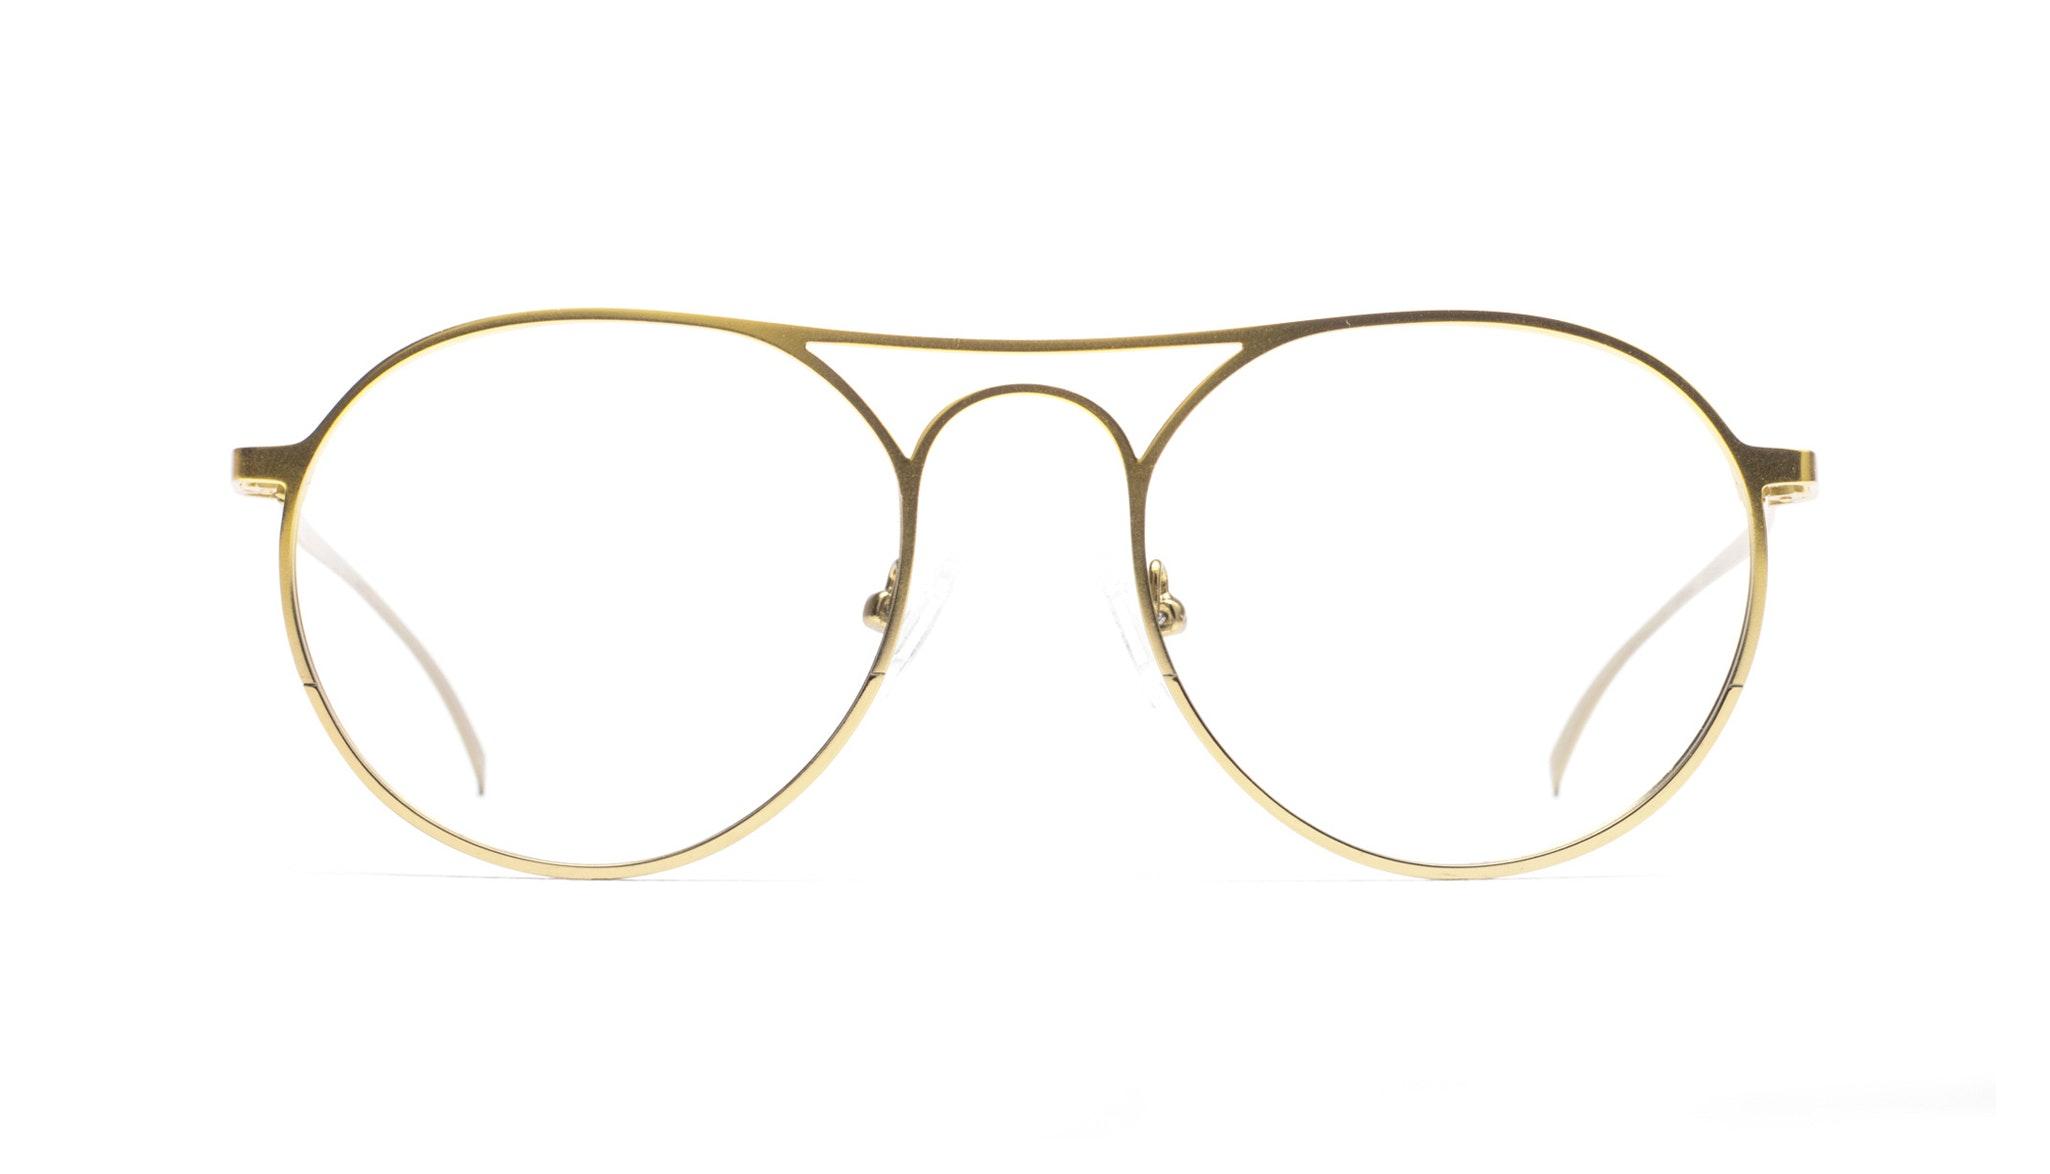 Affordable Fashion Glasses Aviator Round Eyeglasses Men Contour Gold Front